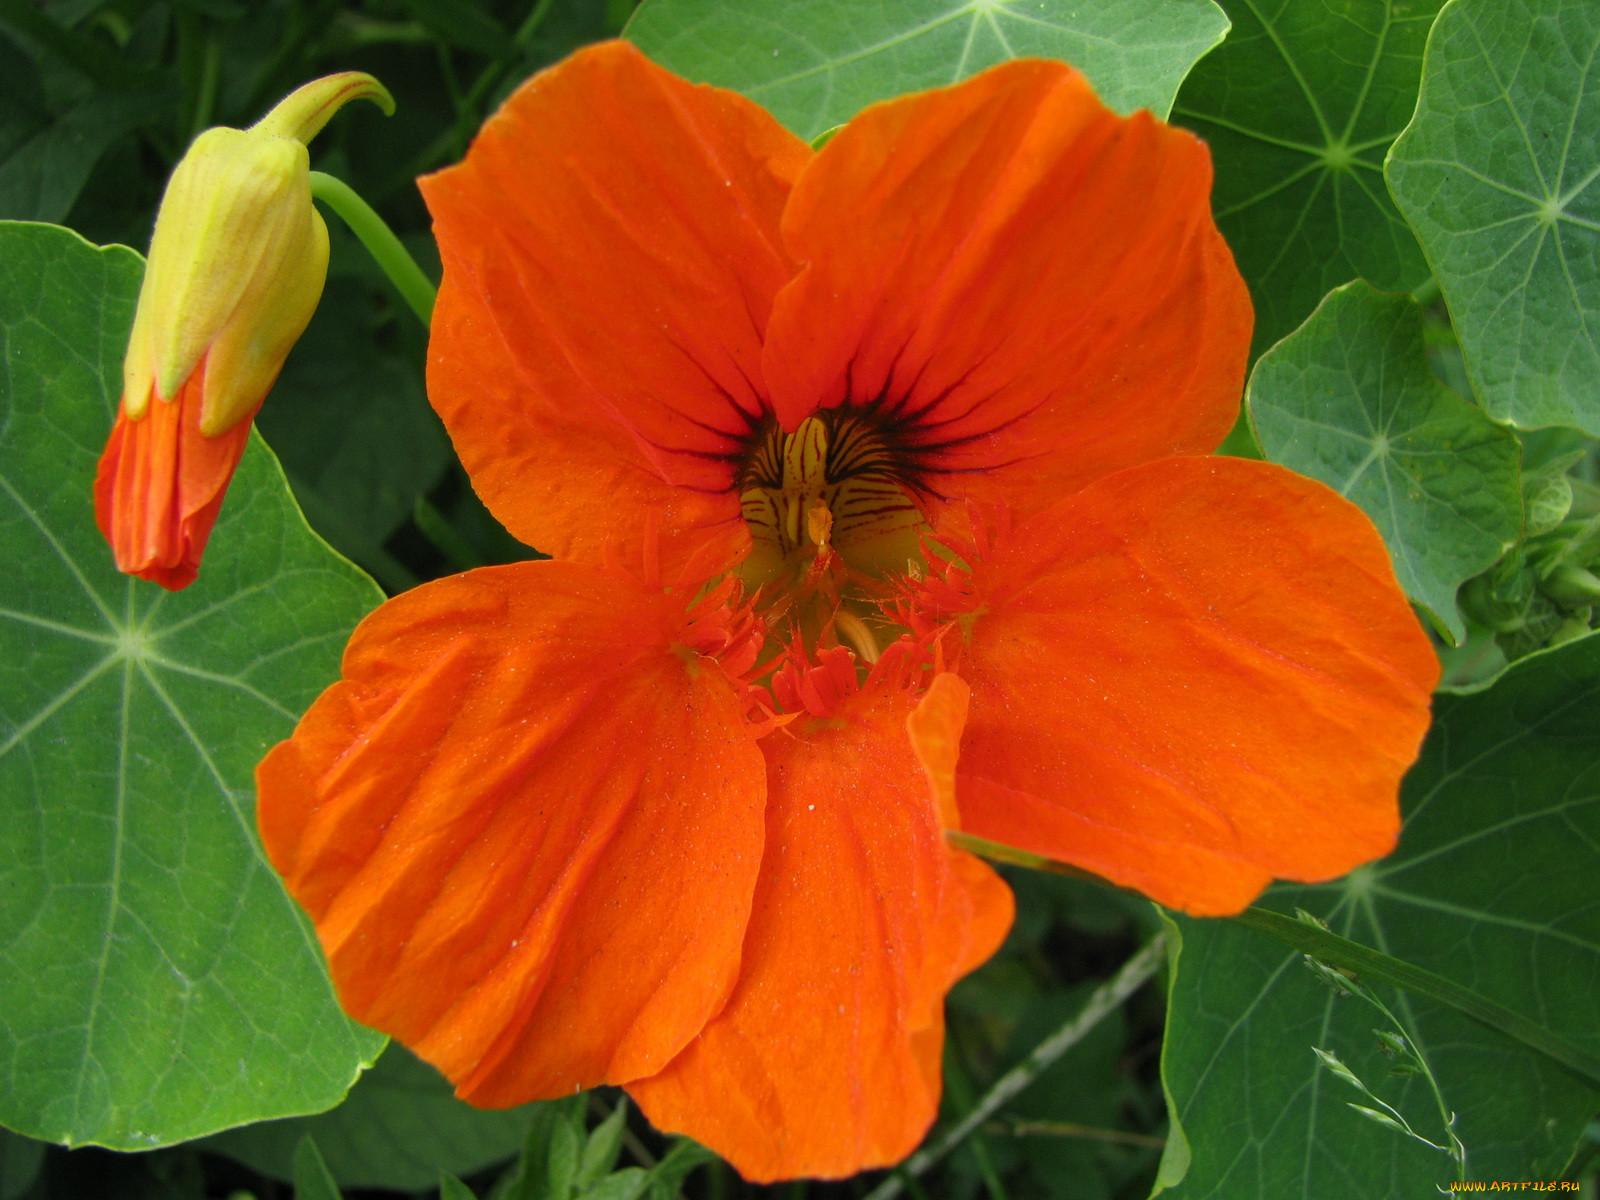 дополняли цветы настурция выращивание фото джейн